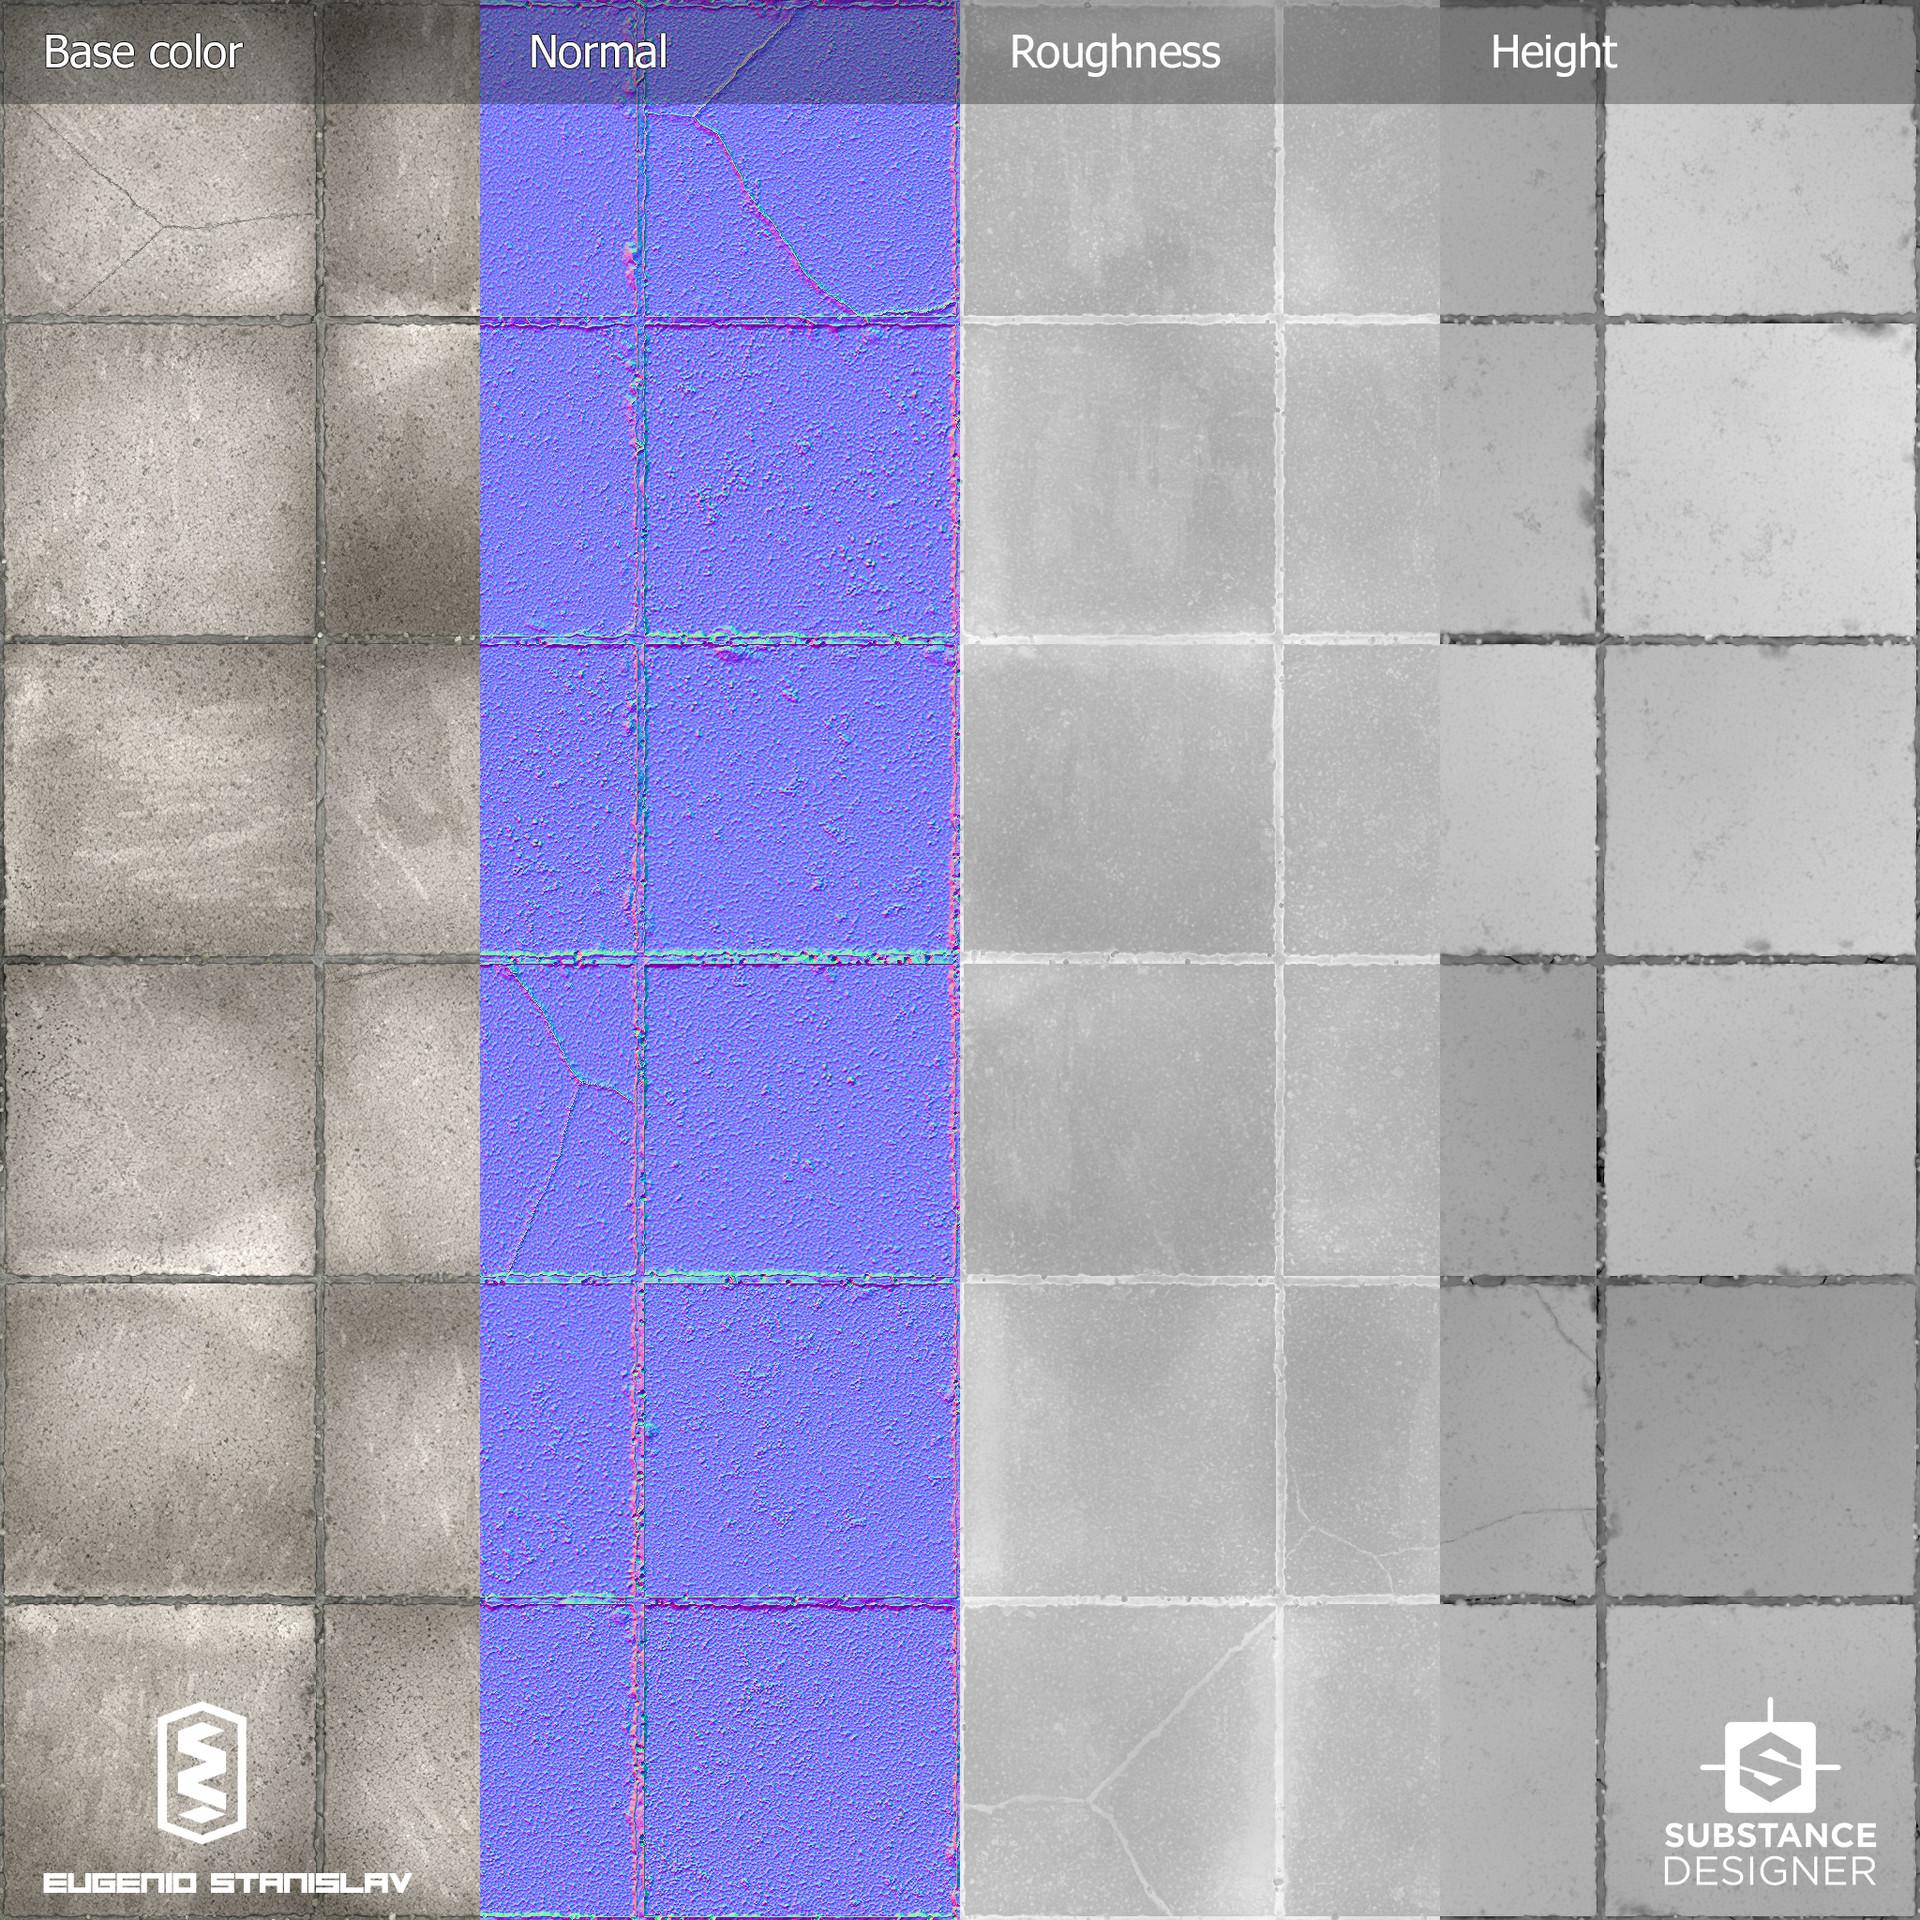 Eugenio stanislav concrete plain tiles maps